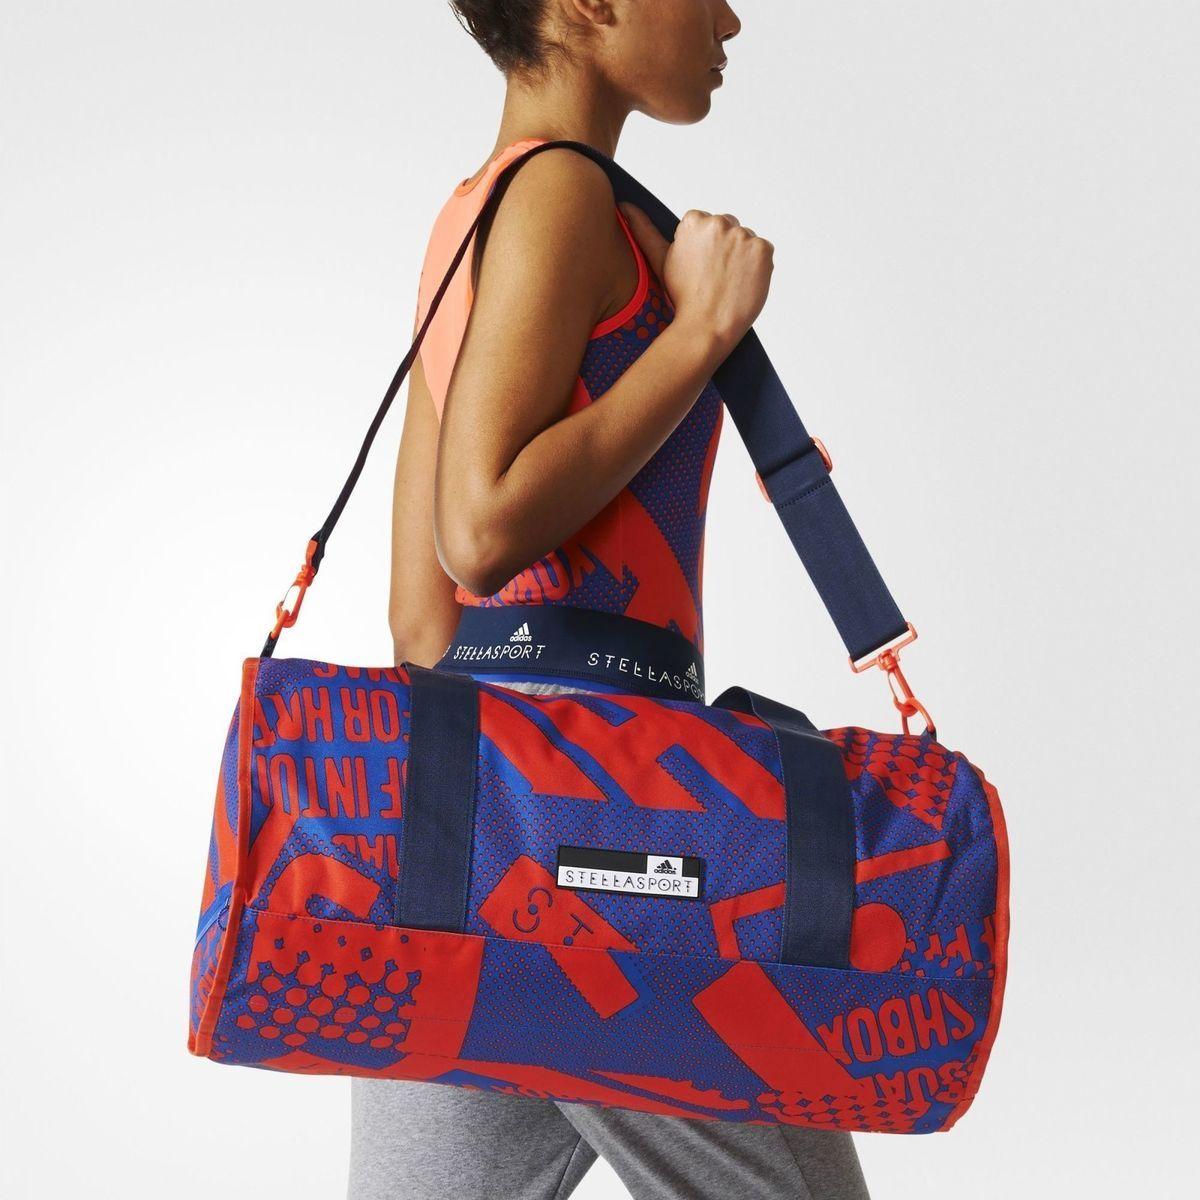 73df19cb54 Adidas StellaSport Graphic Team Bag